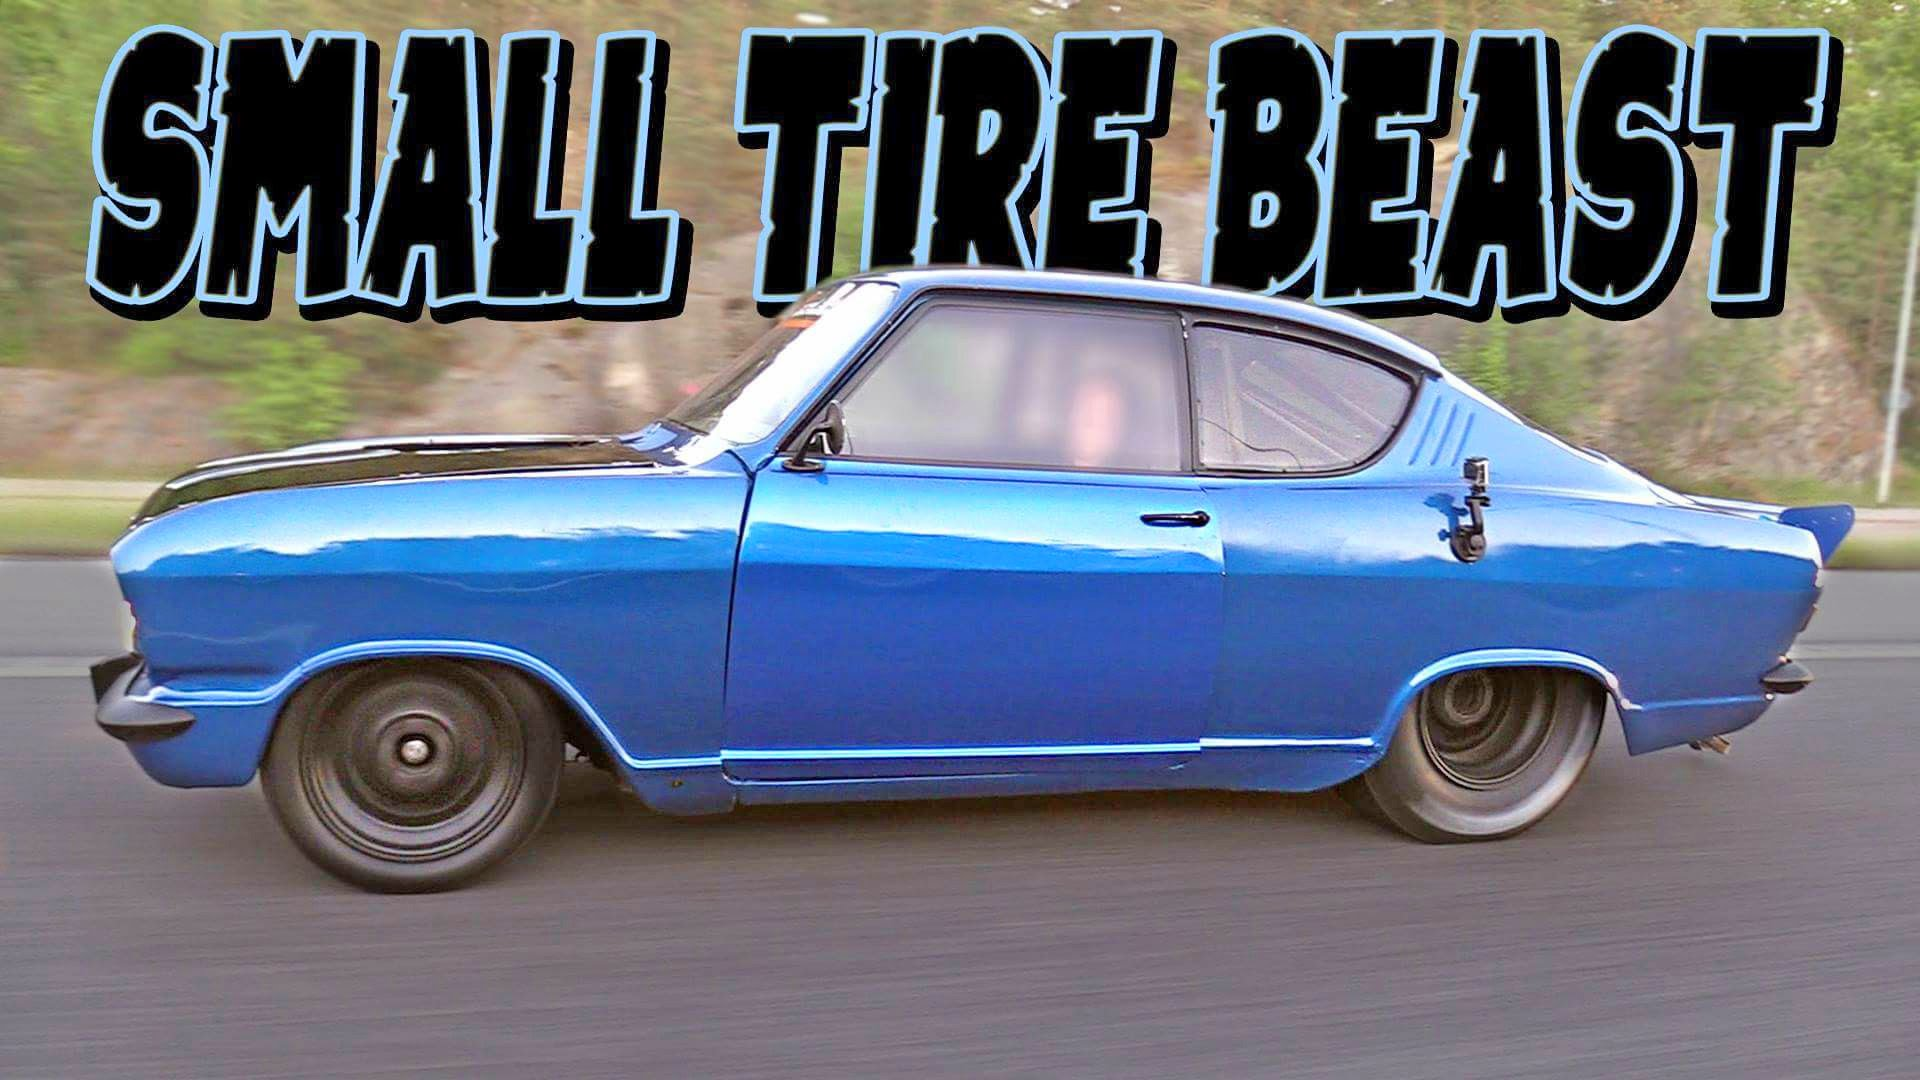 1100HP Opel Kadett Street Beast